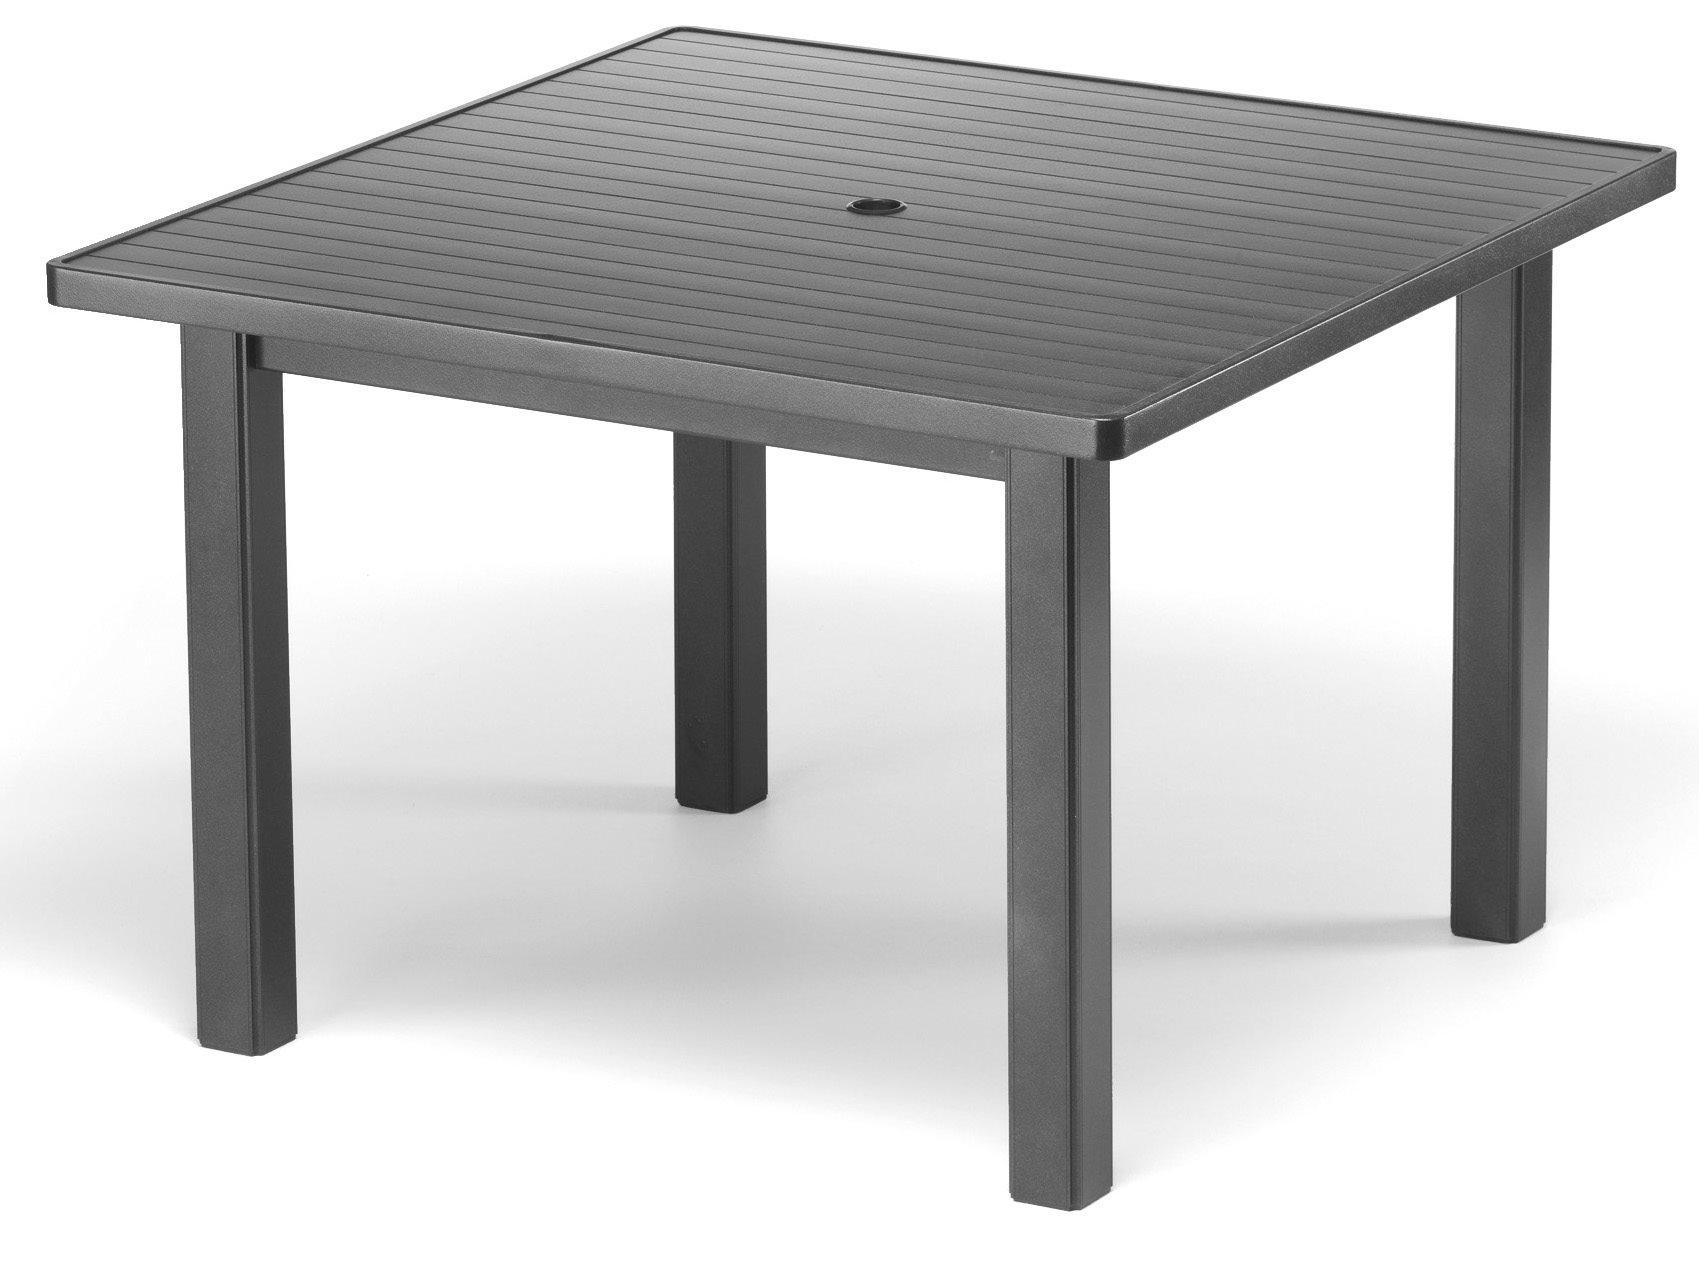 Telescope Casual Aluminum Slat Top 42 Square Dining Table